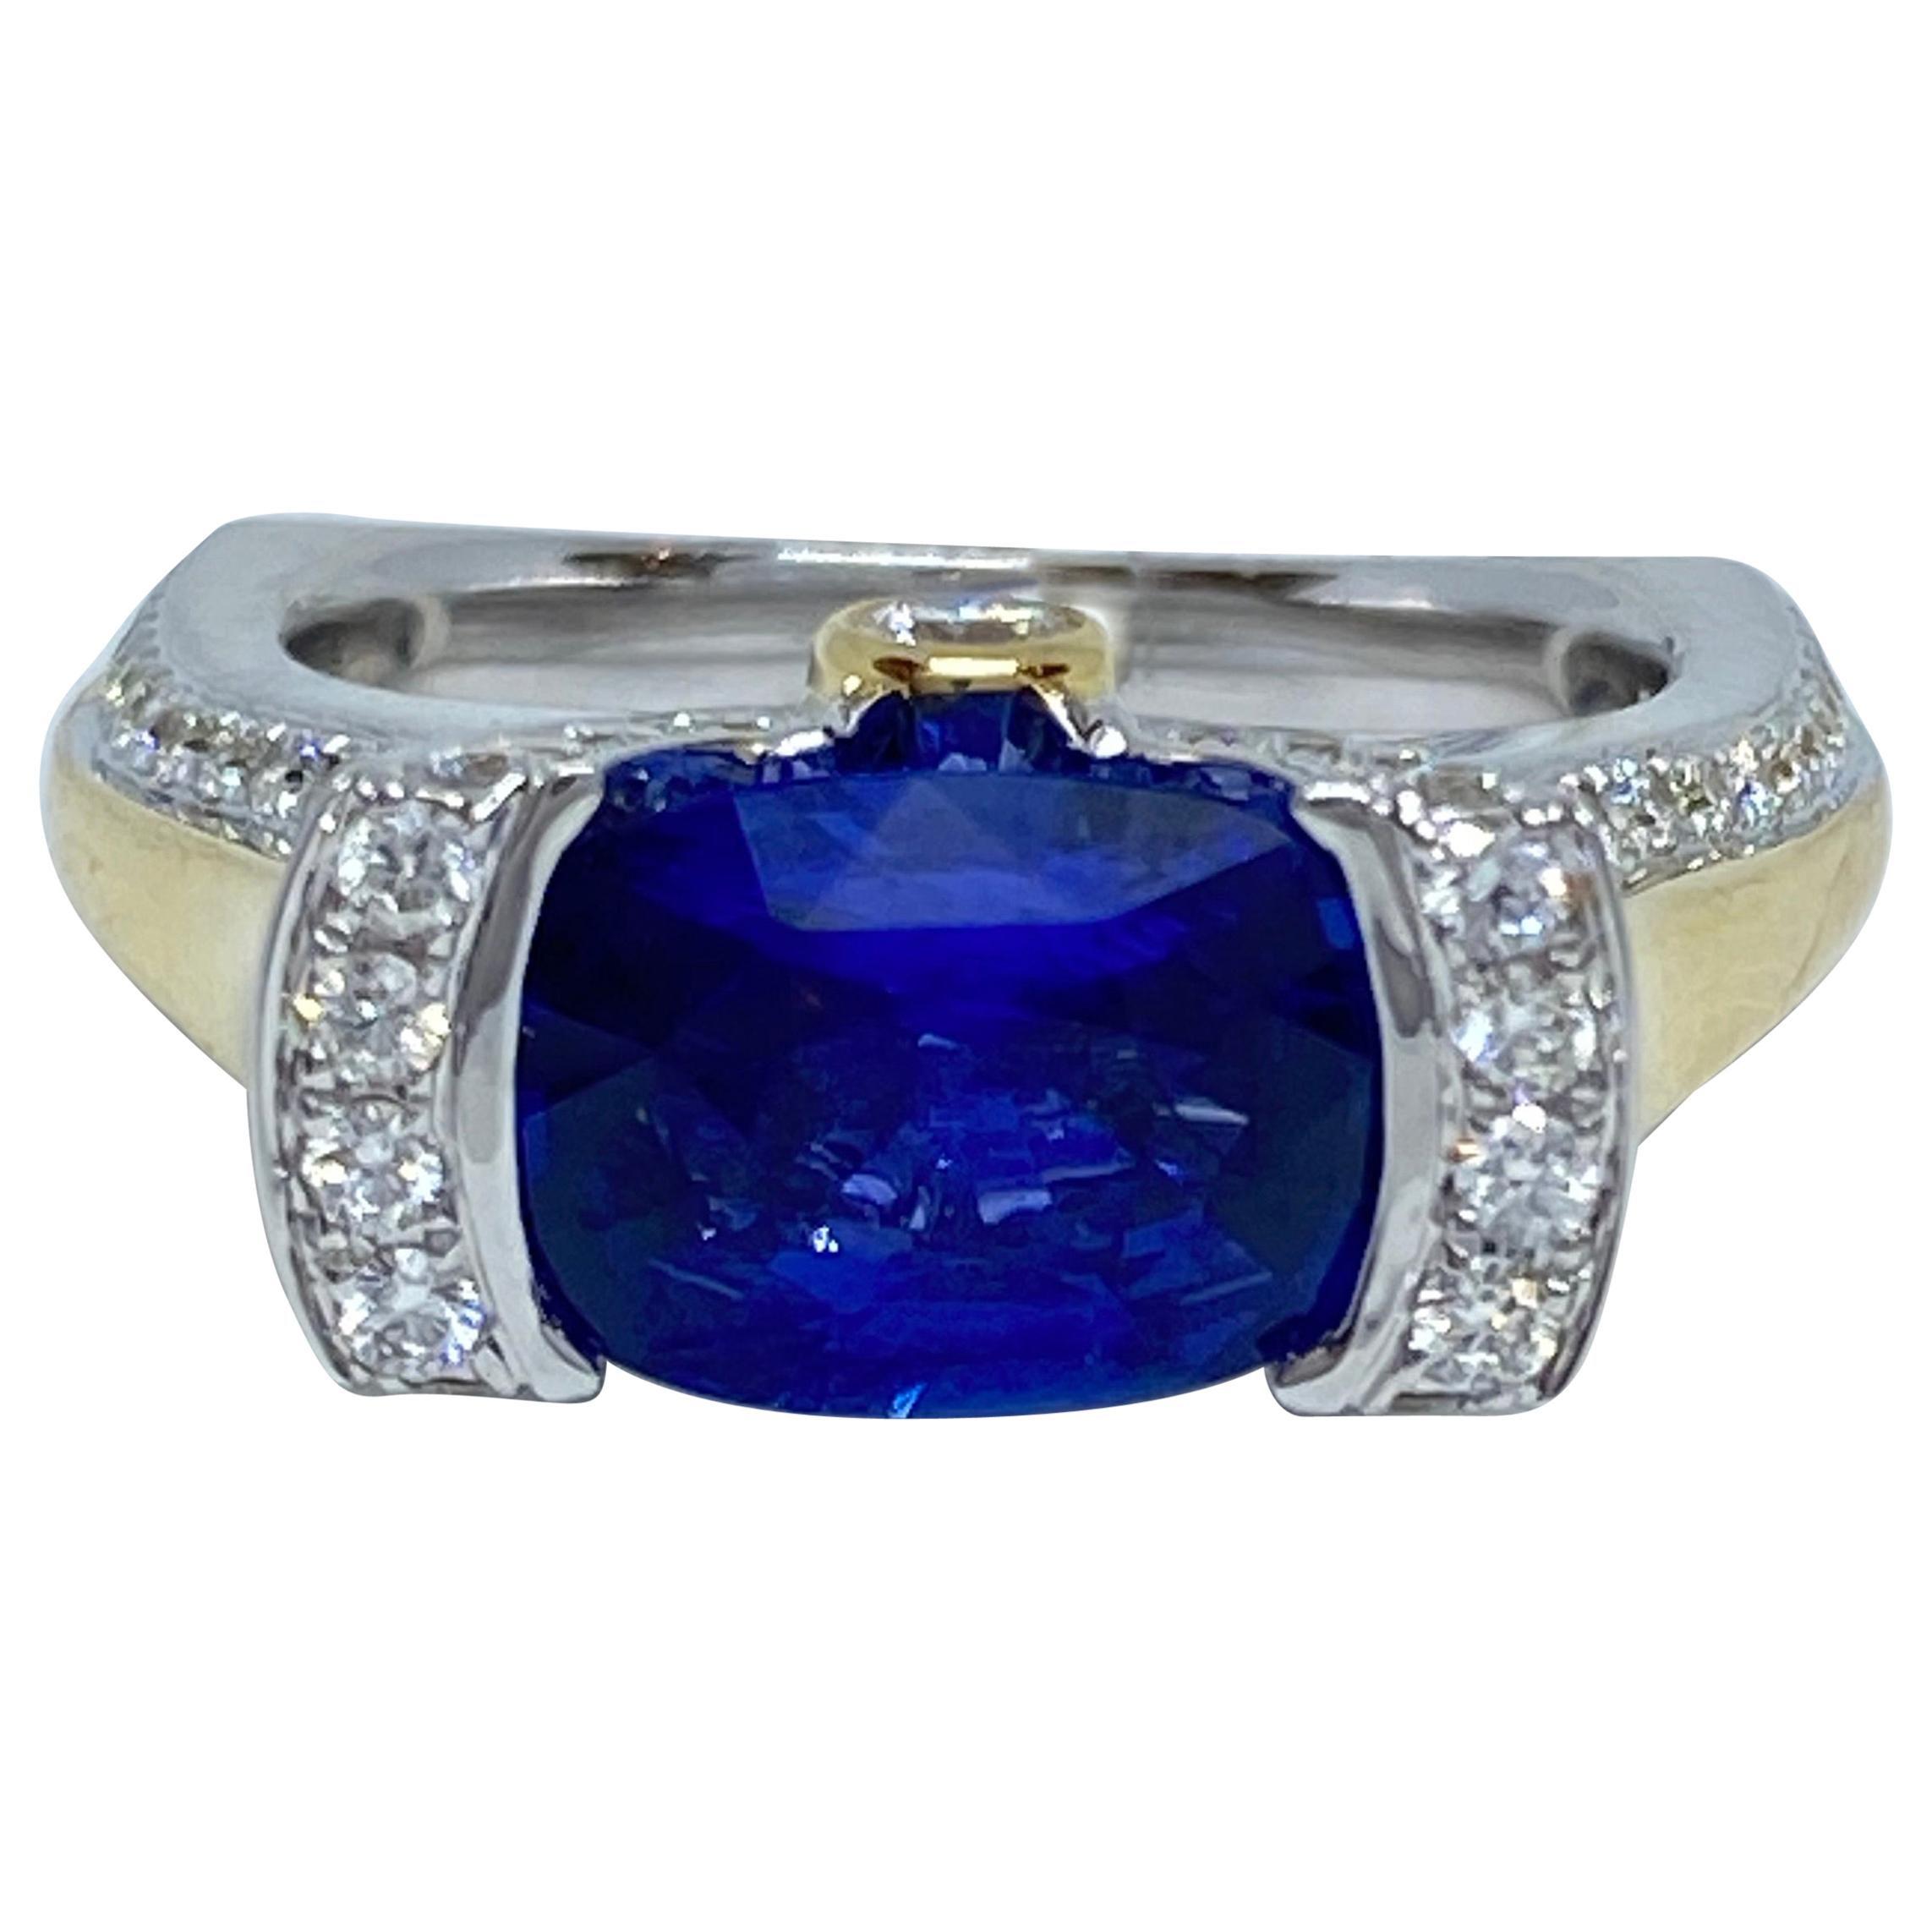 Unique Natural Cushion Cut Ceylon Sapphire and Diamond Ring 3.07 Carat 18K Gold